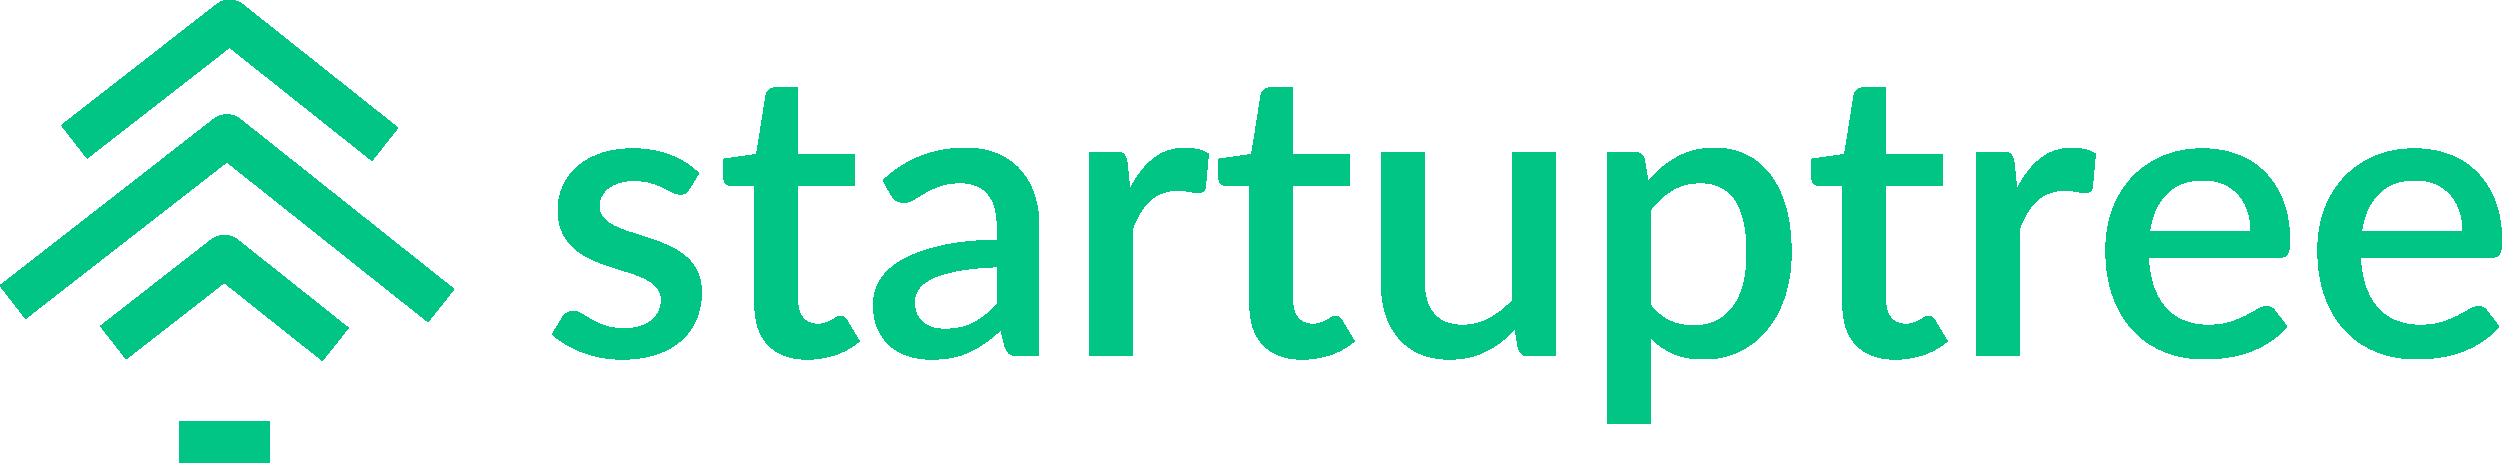 StartupTree platform logo